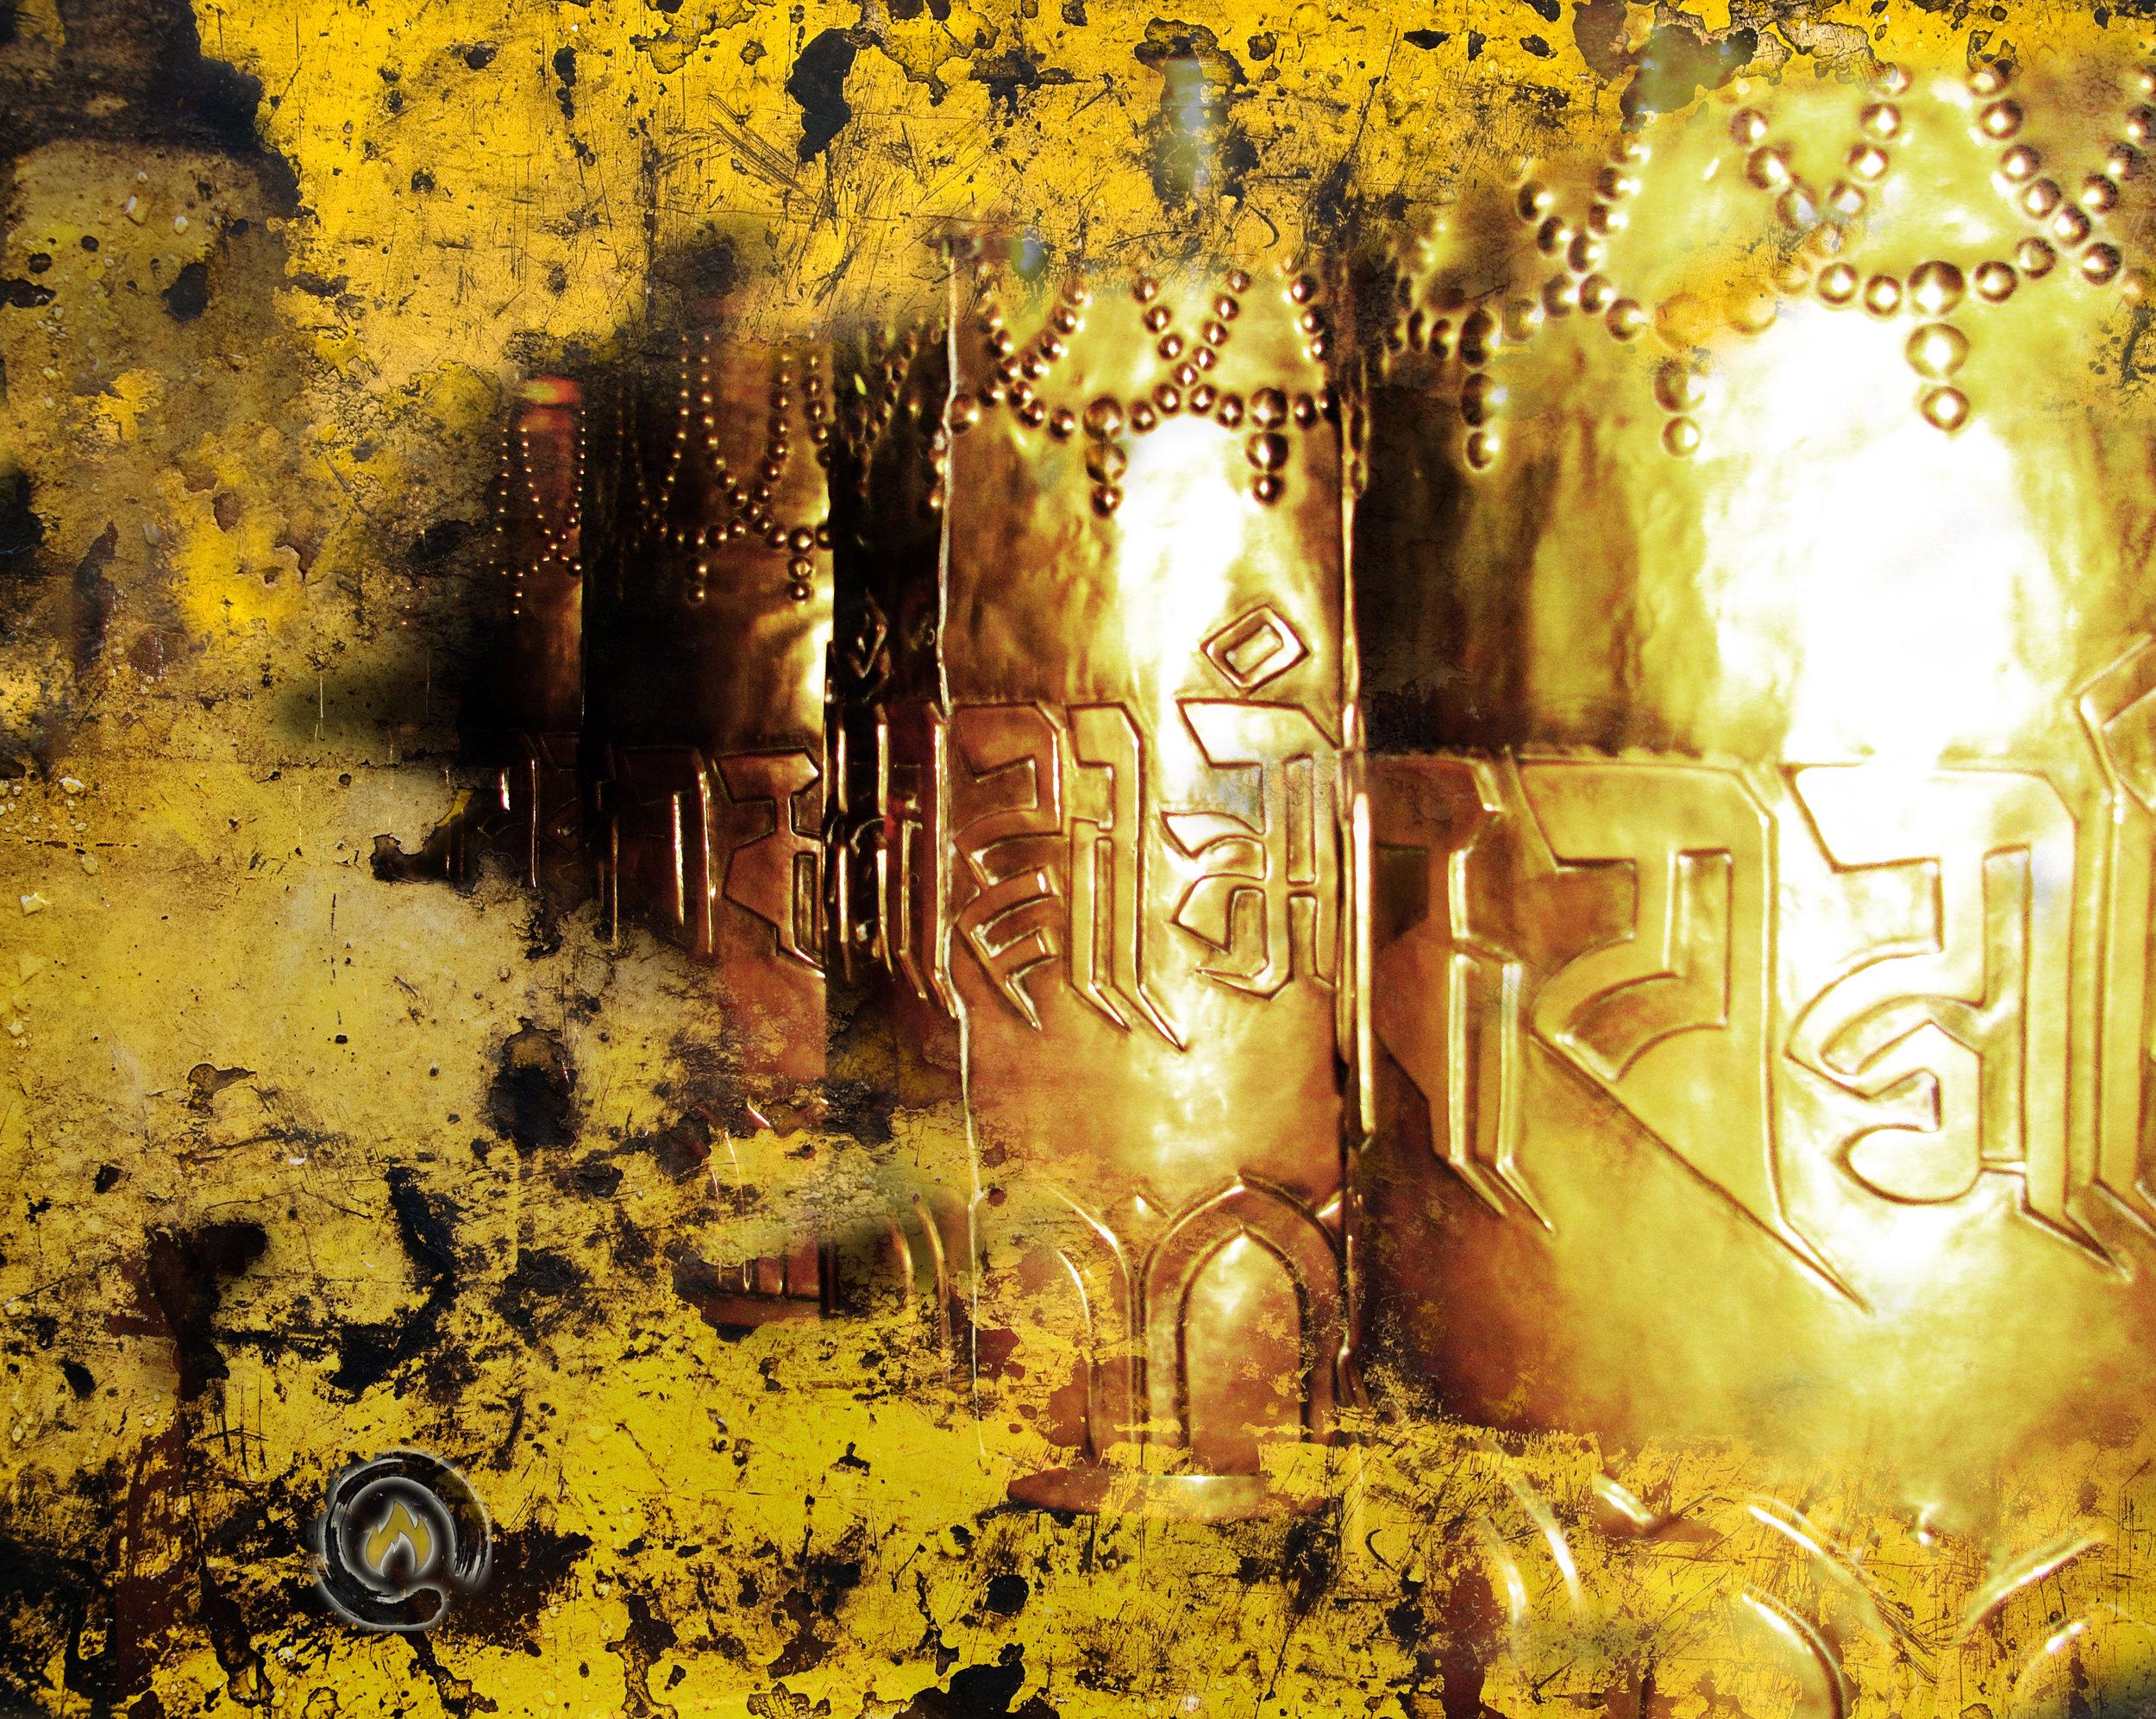 India2010 524.jpg